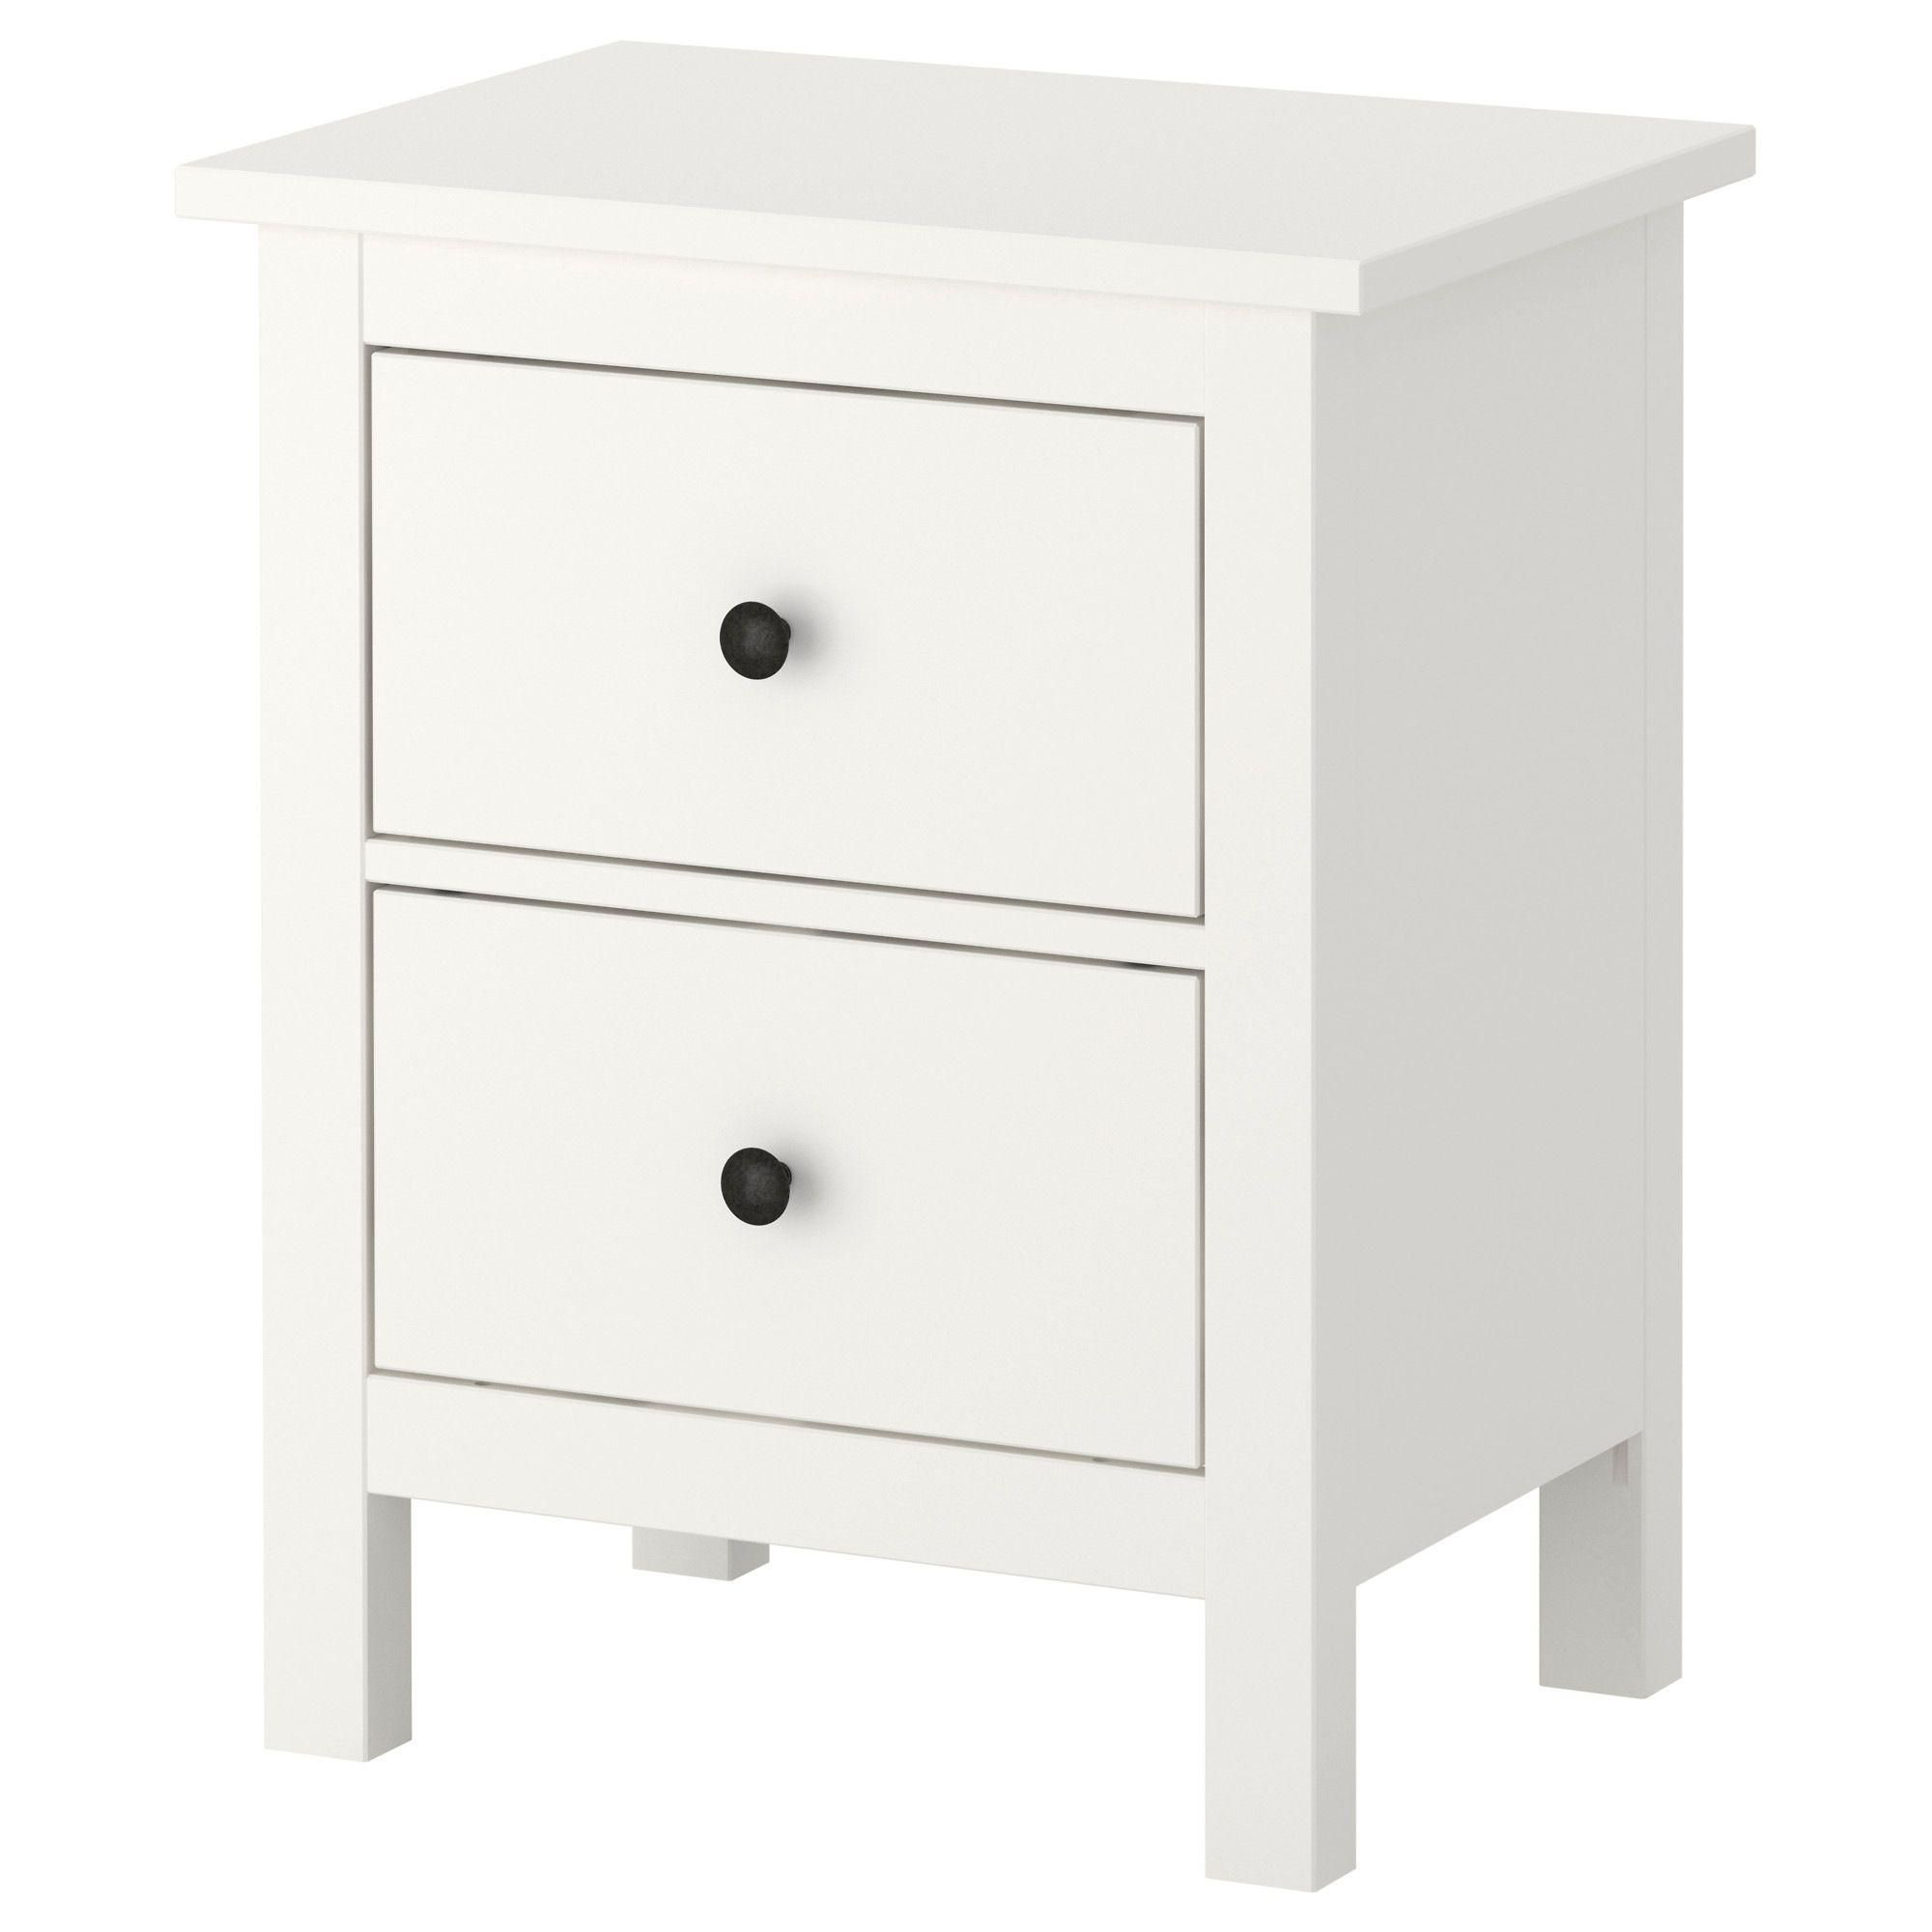 Hemnes Coffee Table White Stain 90 X 90 Cm: Ikea 2 Drawer Dresser